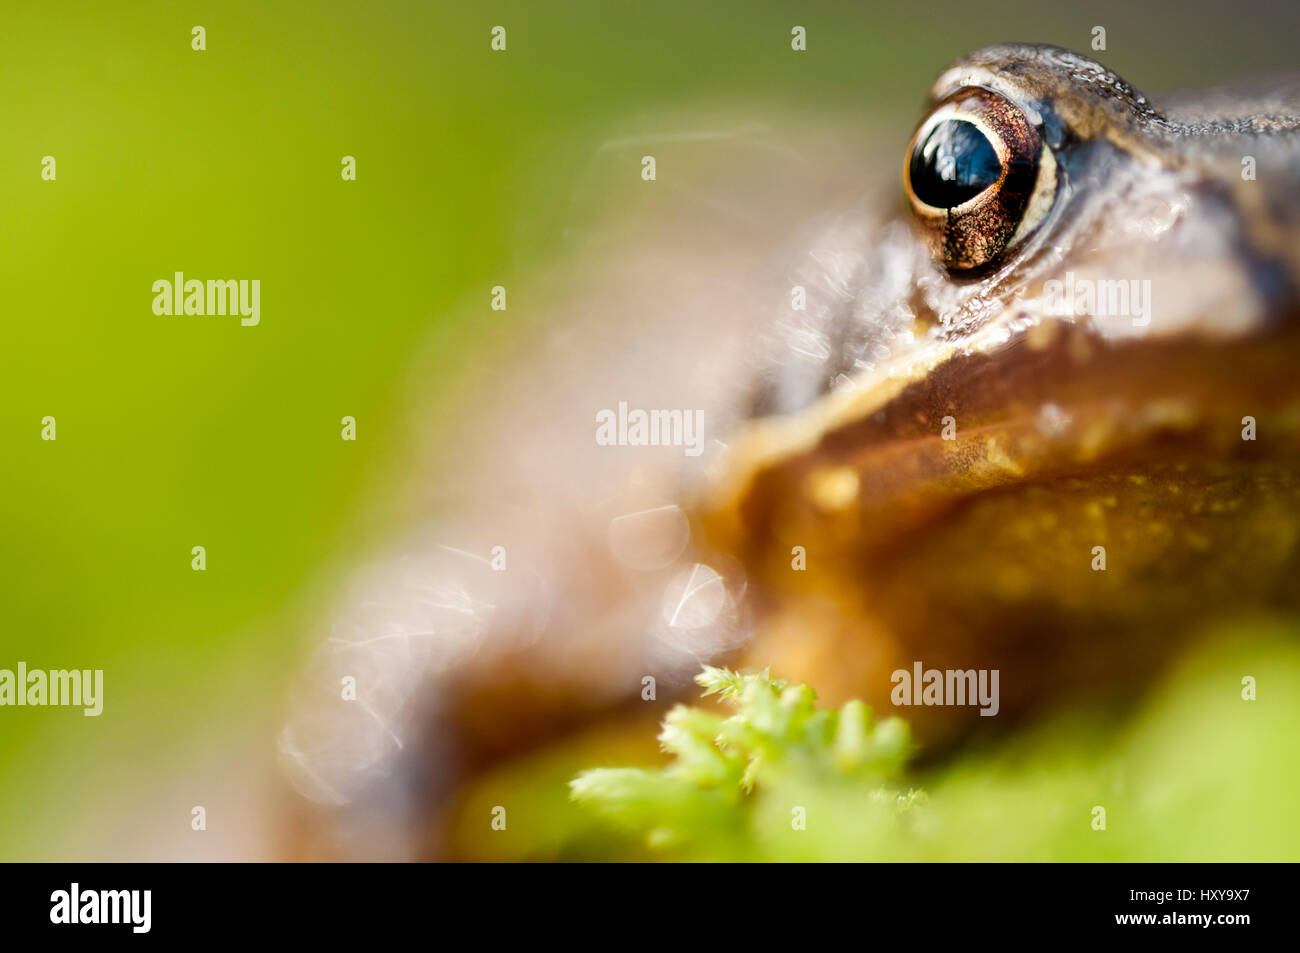 Common frog (Rana temporaria) portrait, Cornwall, UK, January. - Stock Image